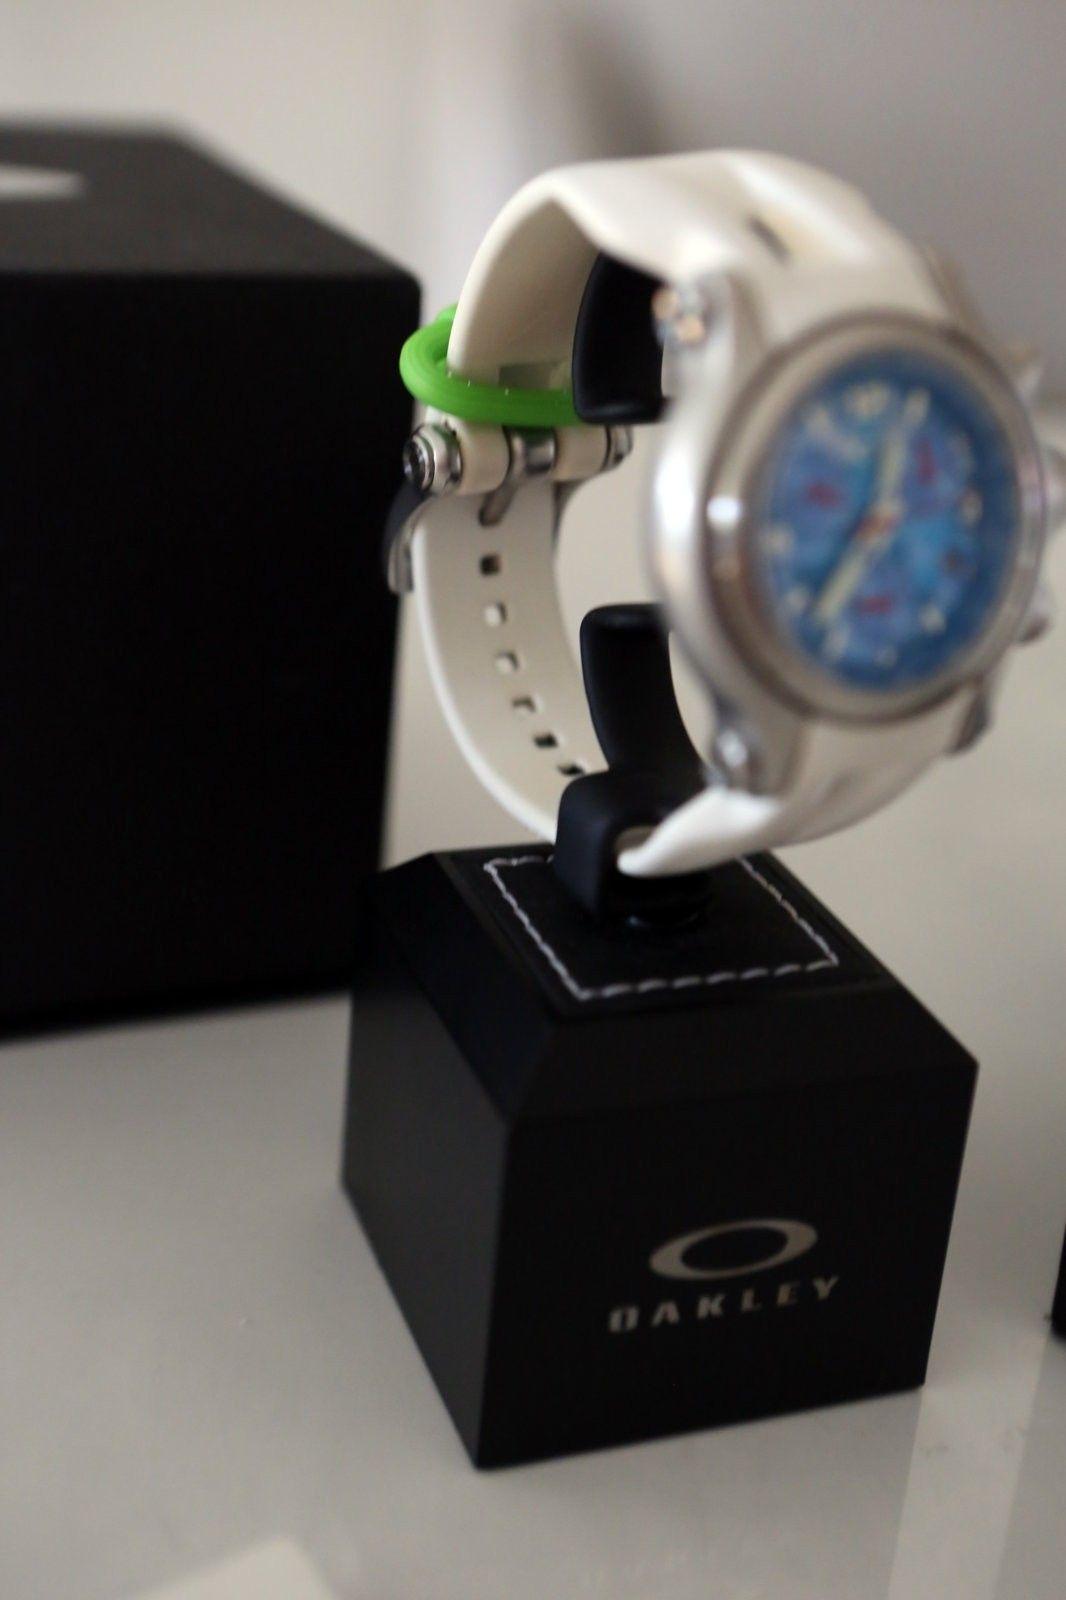 Holeshot Watch Band Broke - Question - W90A5840.JPG